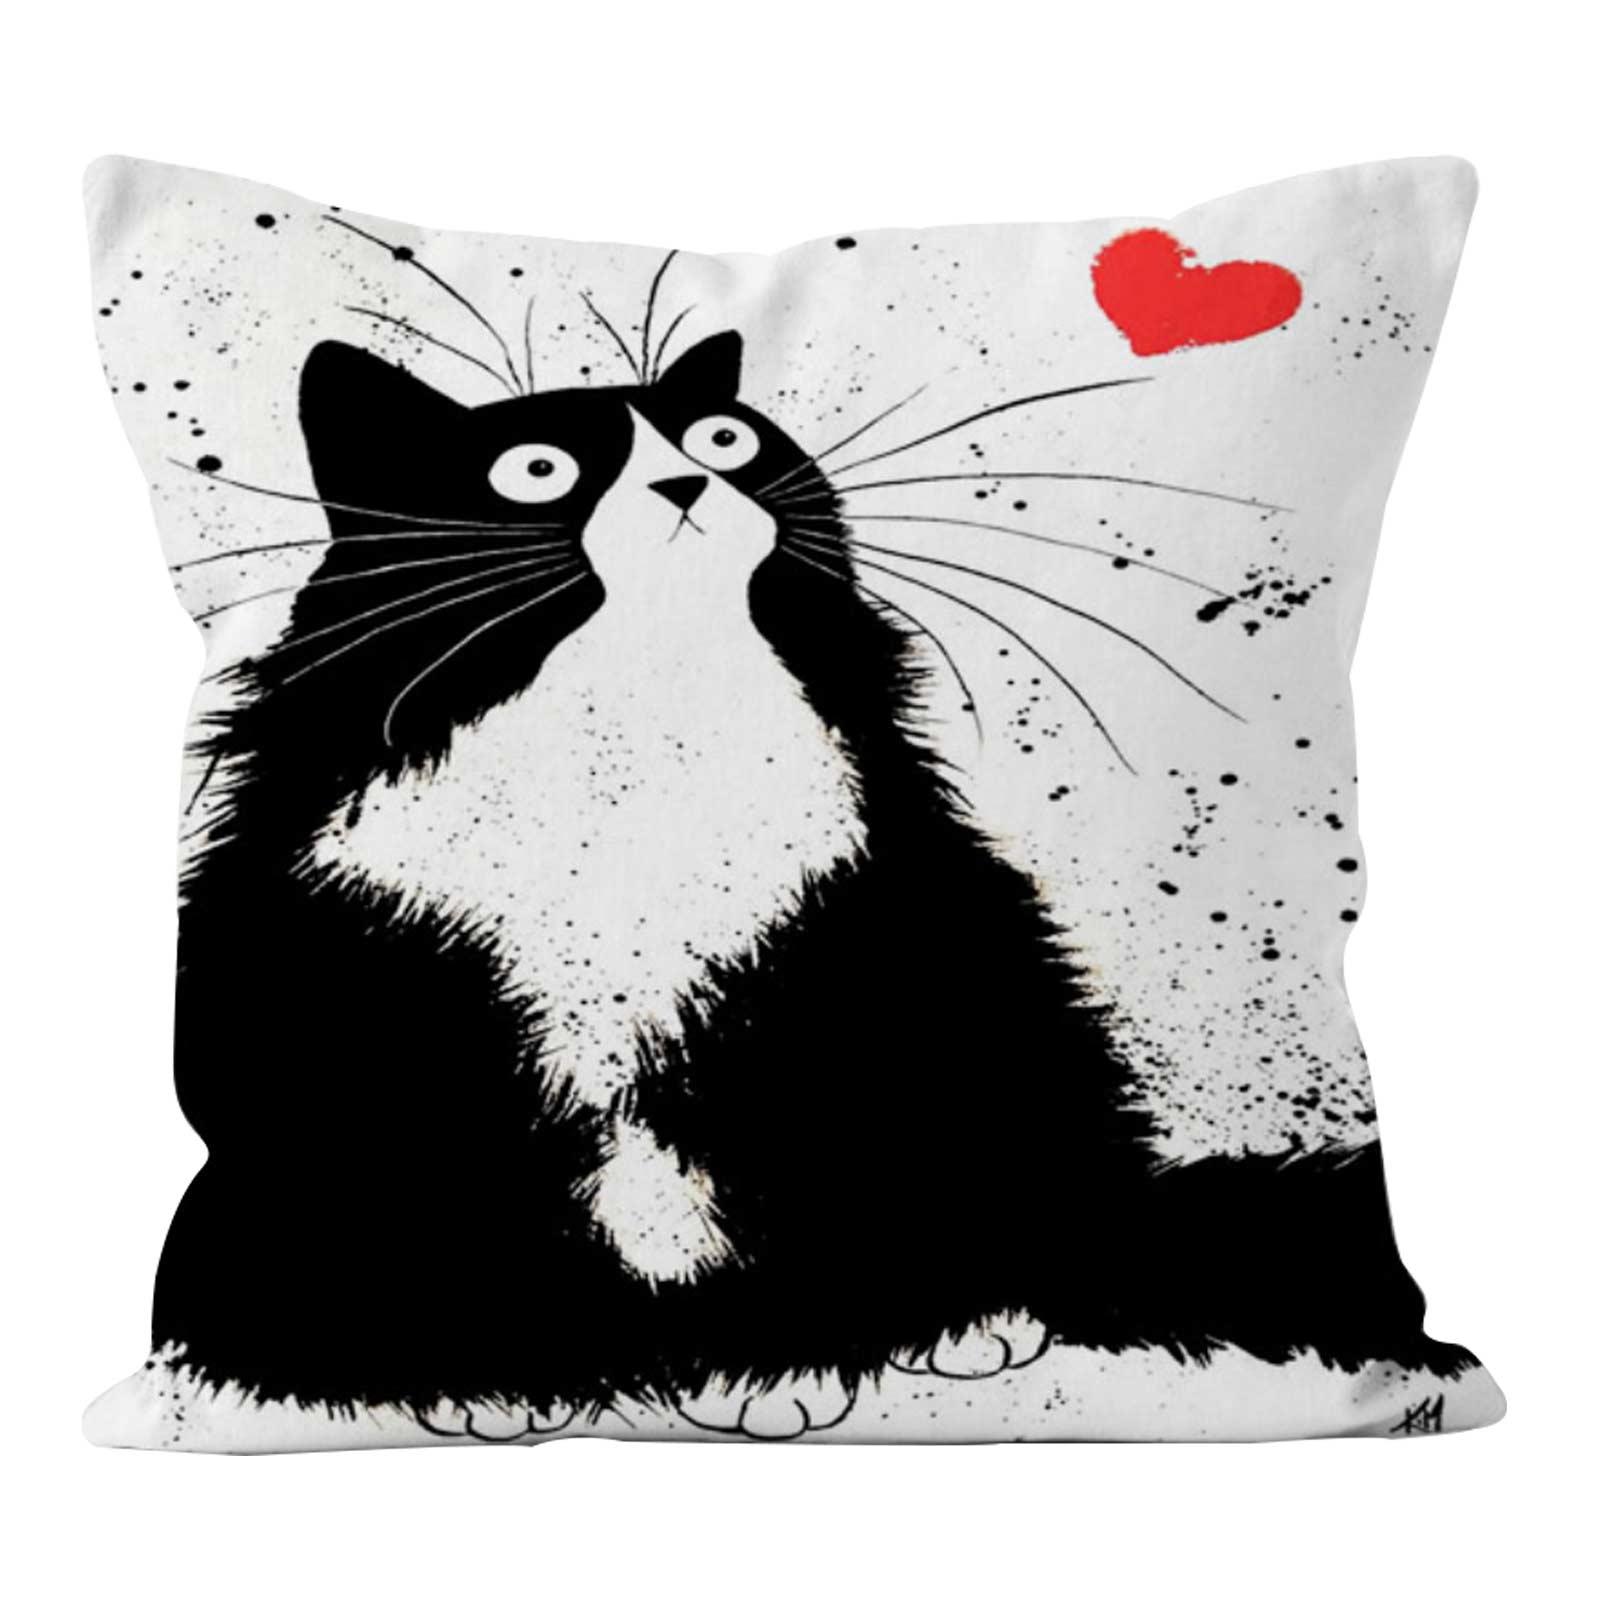 1 Kissenhülle Katzenfreund Kissenbezug Katzenmotiv Dekokissen Leinenstruktur – Bild 7